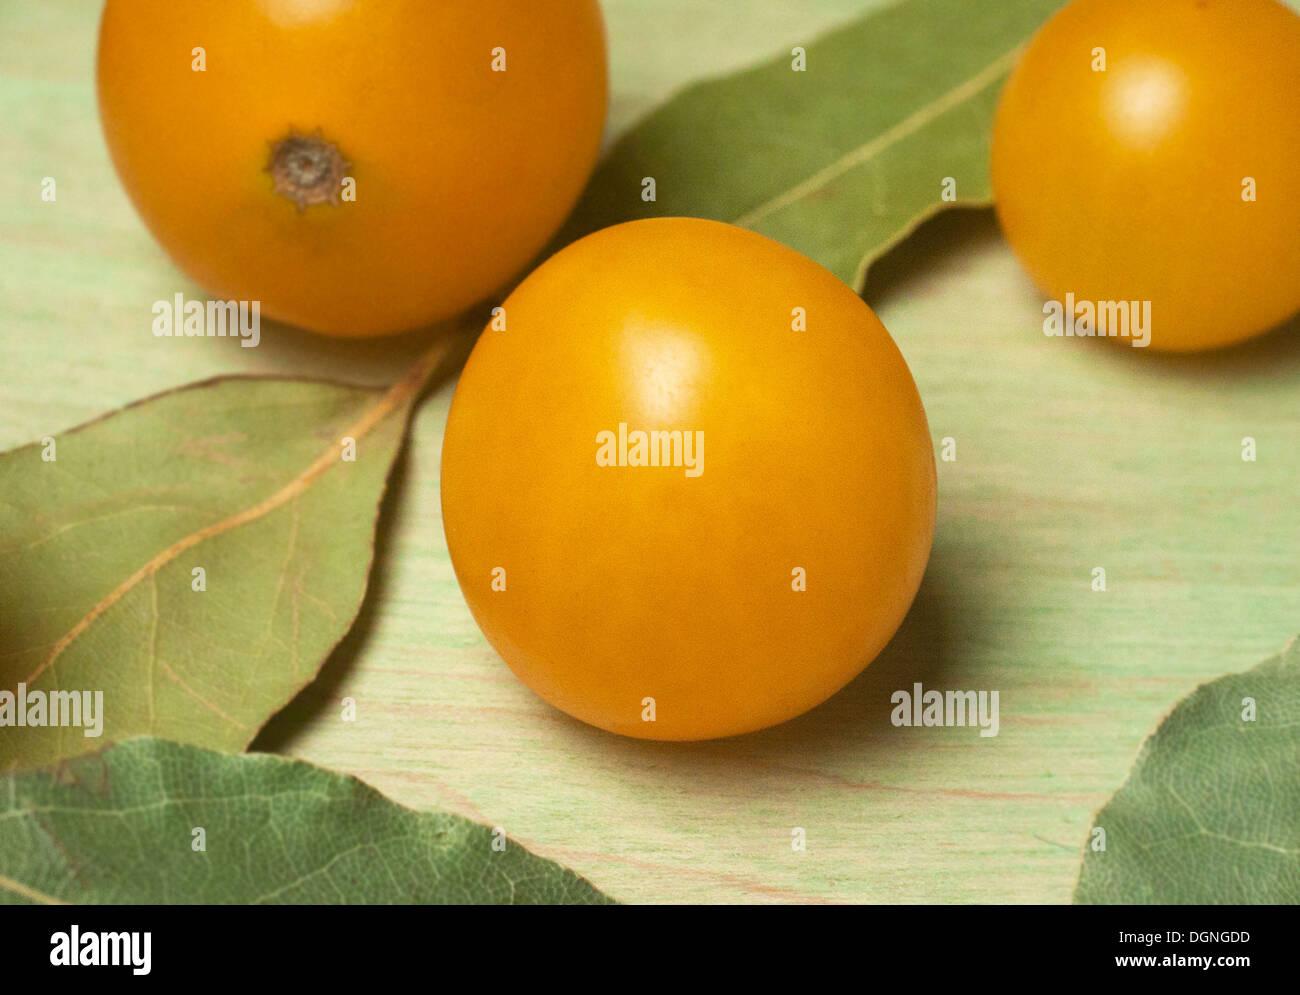 Yellow grape tomato close up - Stock Image